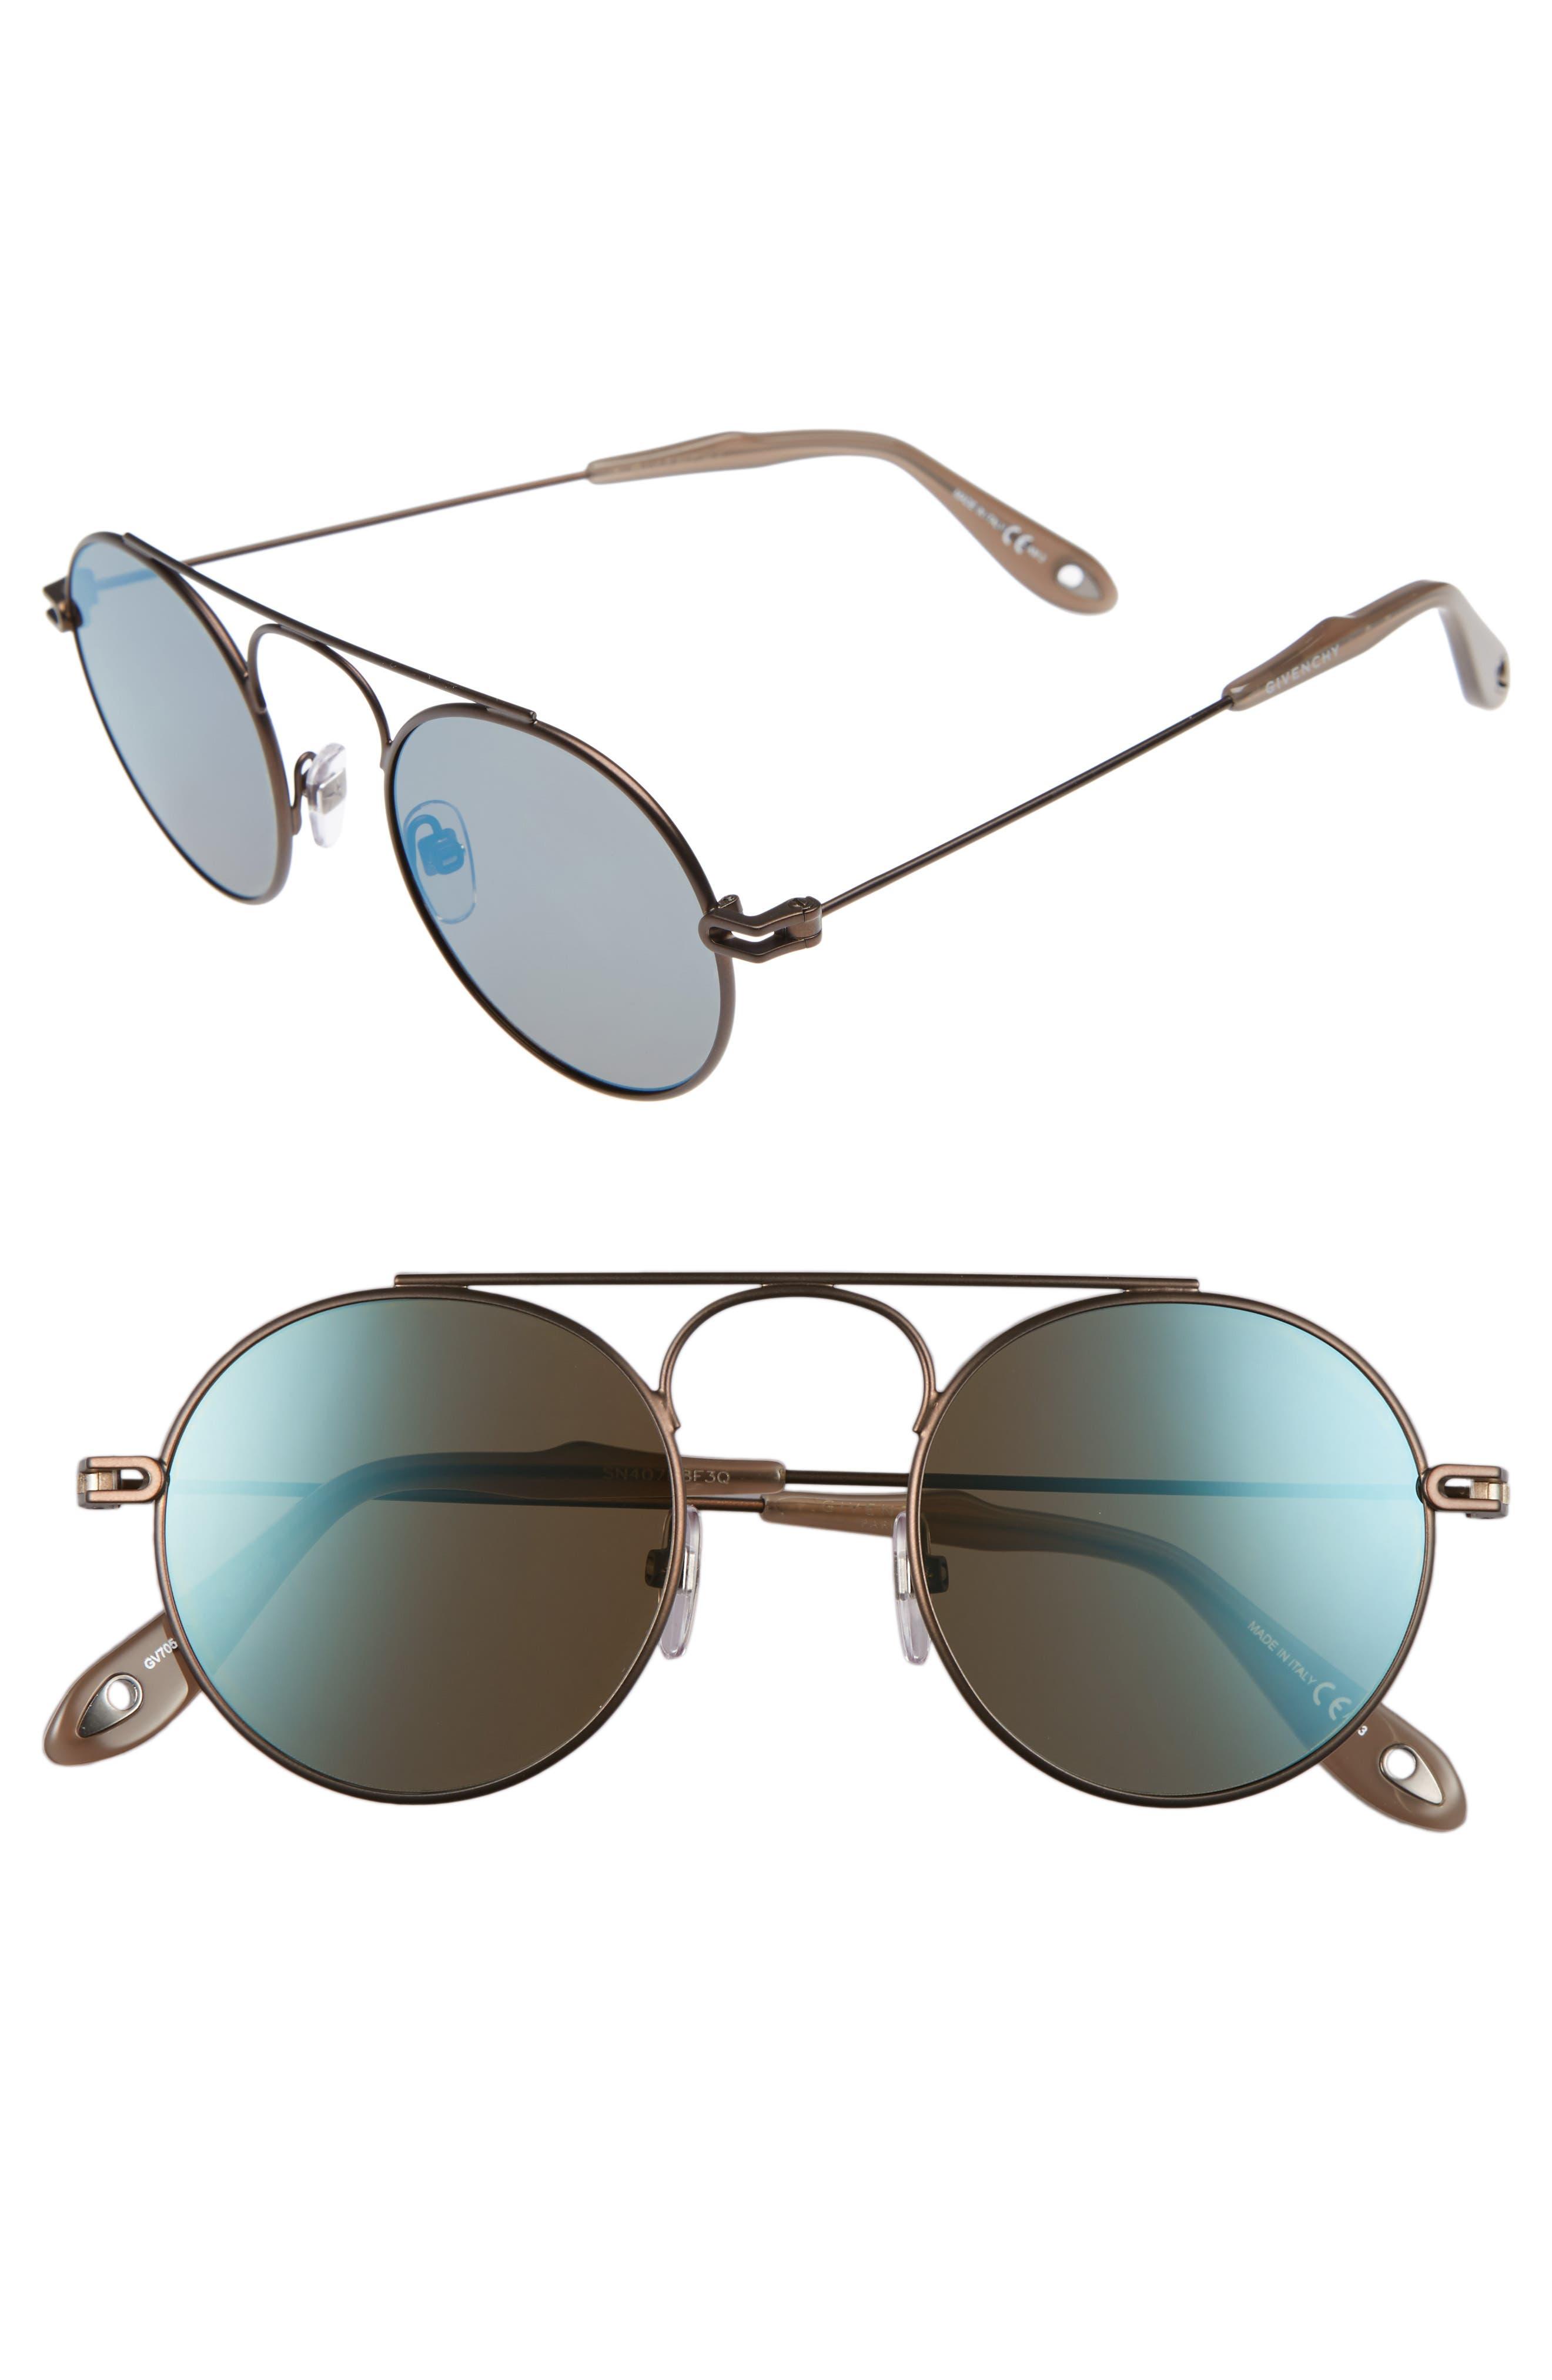 Main Image - Givenchy 48mm Retro Sunglasses